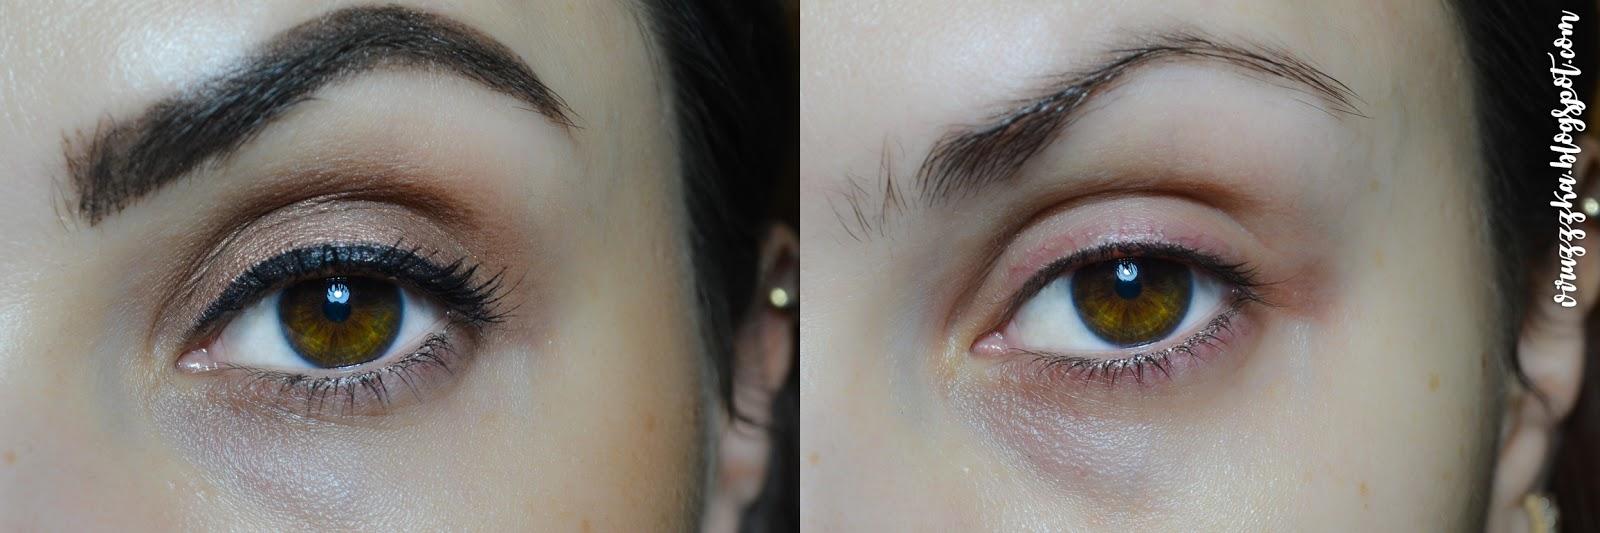 "Nivea MicellAir Skin Breathe Micellar Water Мицеллярная вода ""Дыхание кожи для чувствительной кожи"" Review & Swatches"